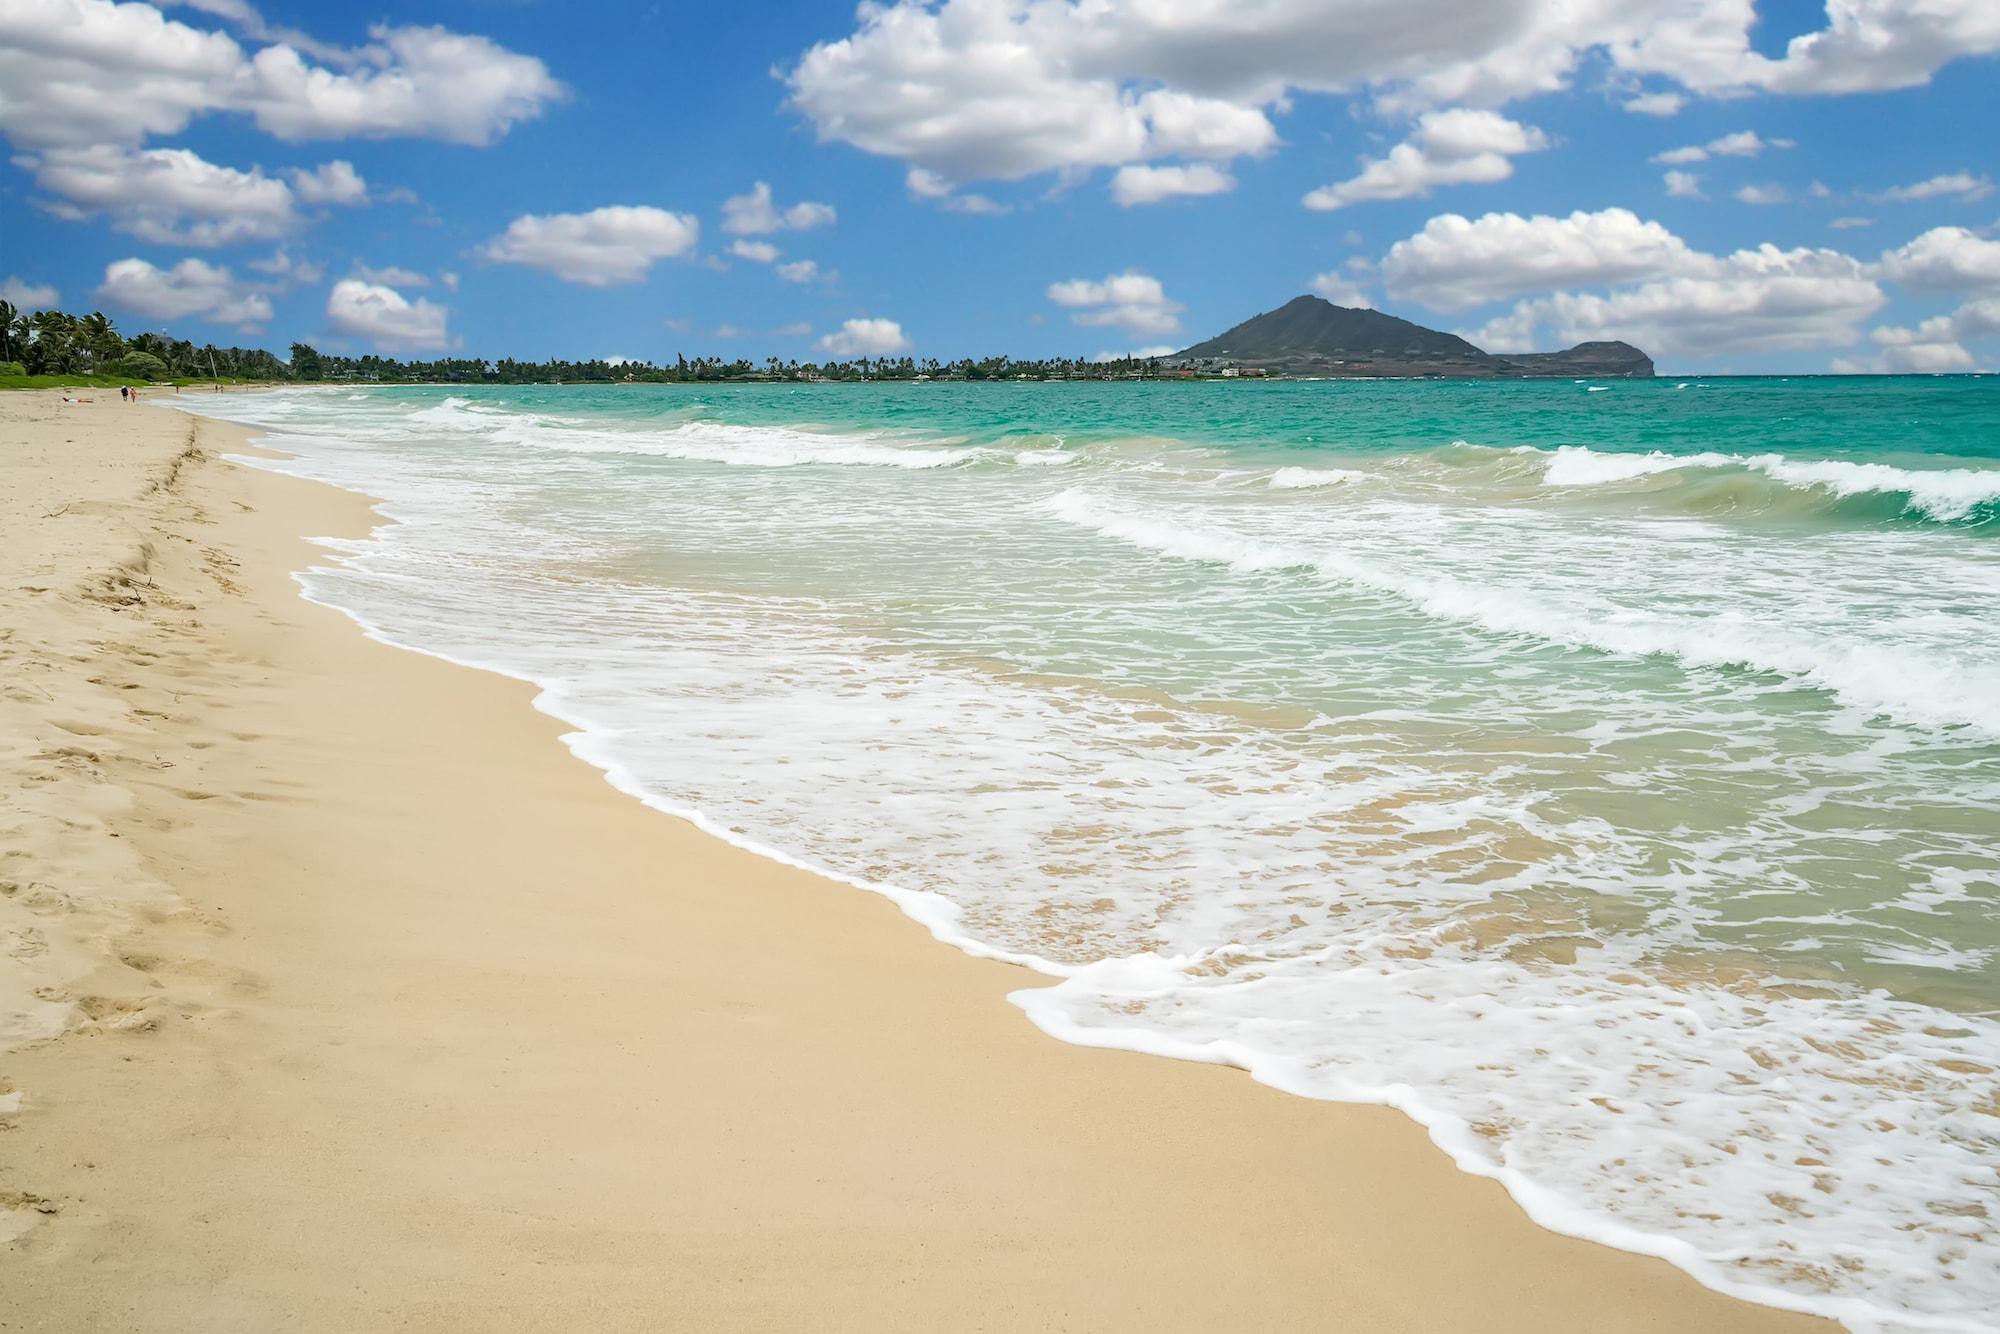 sandy beach in hawaii